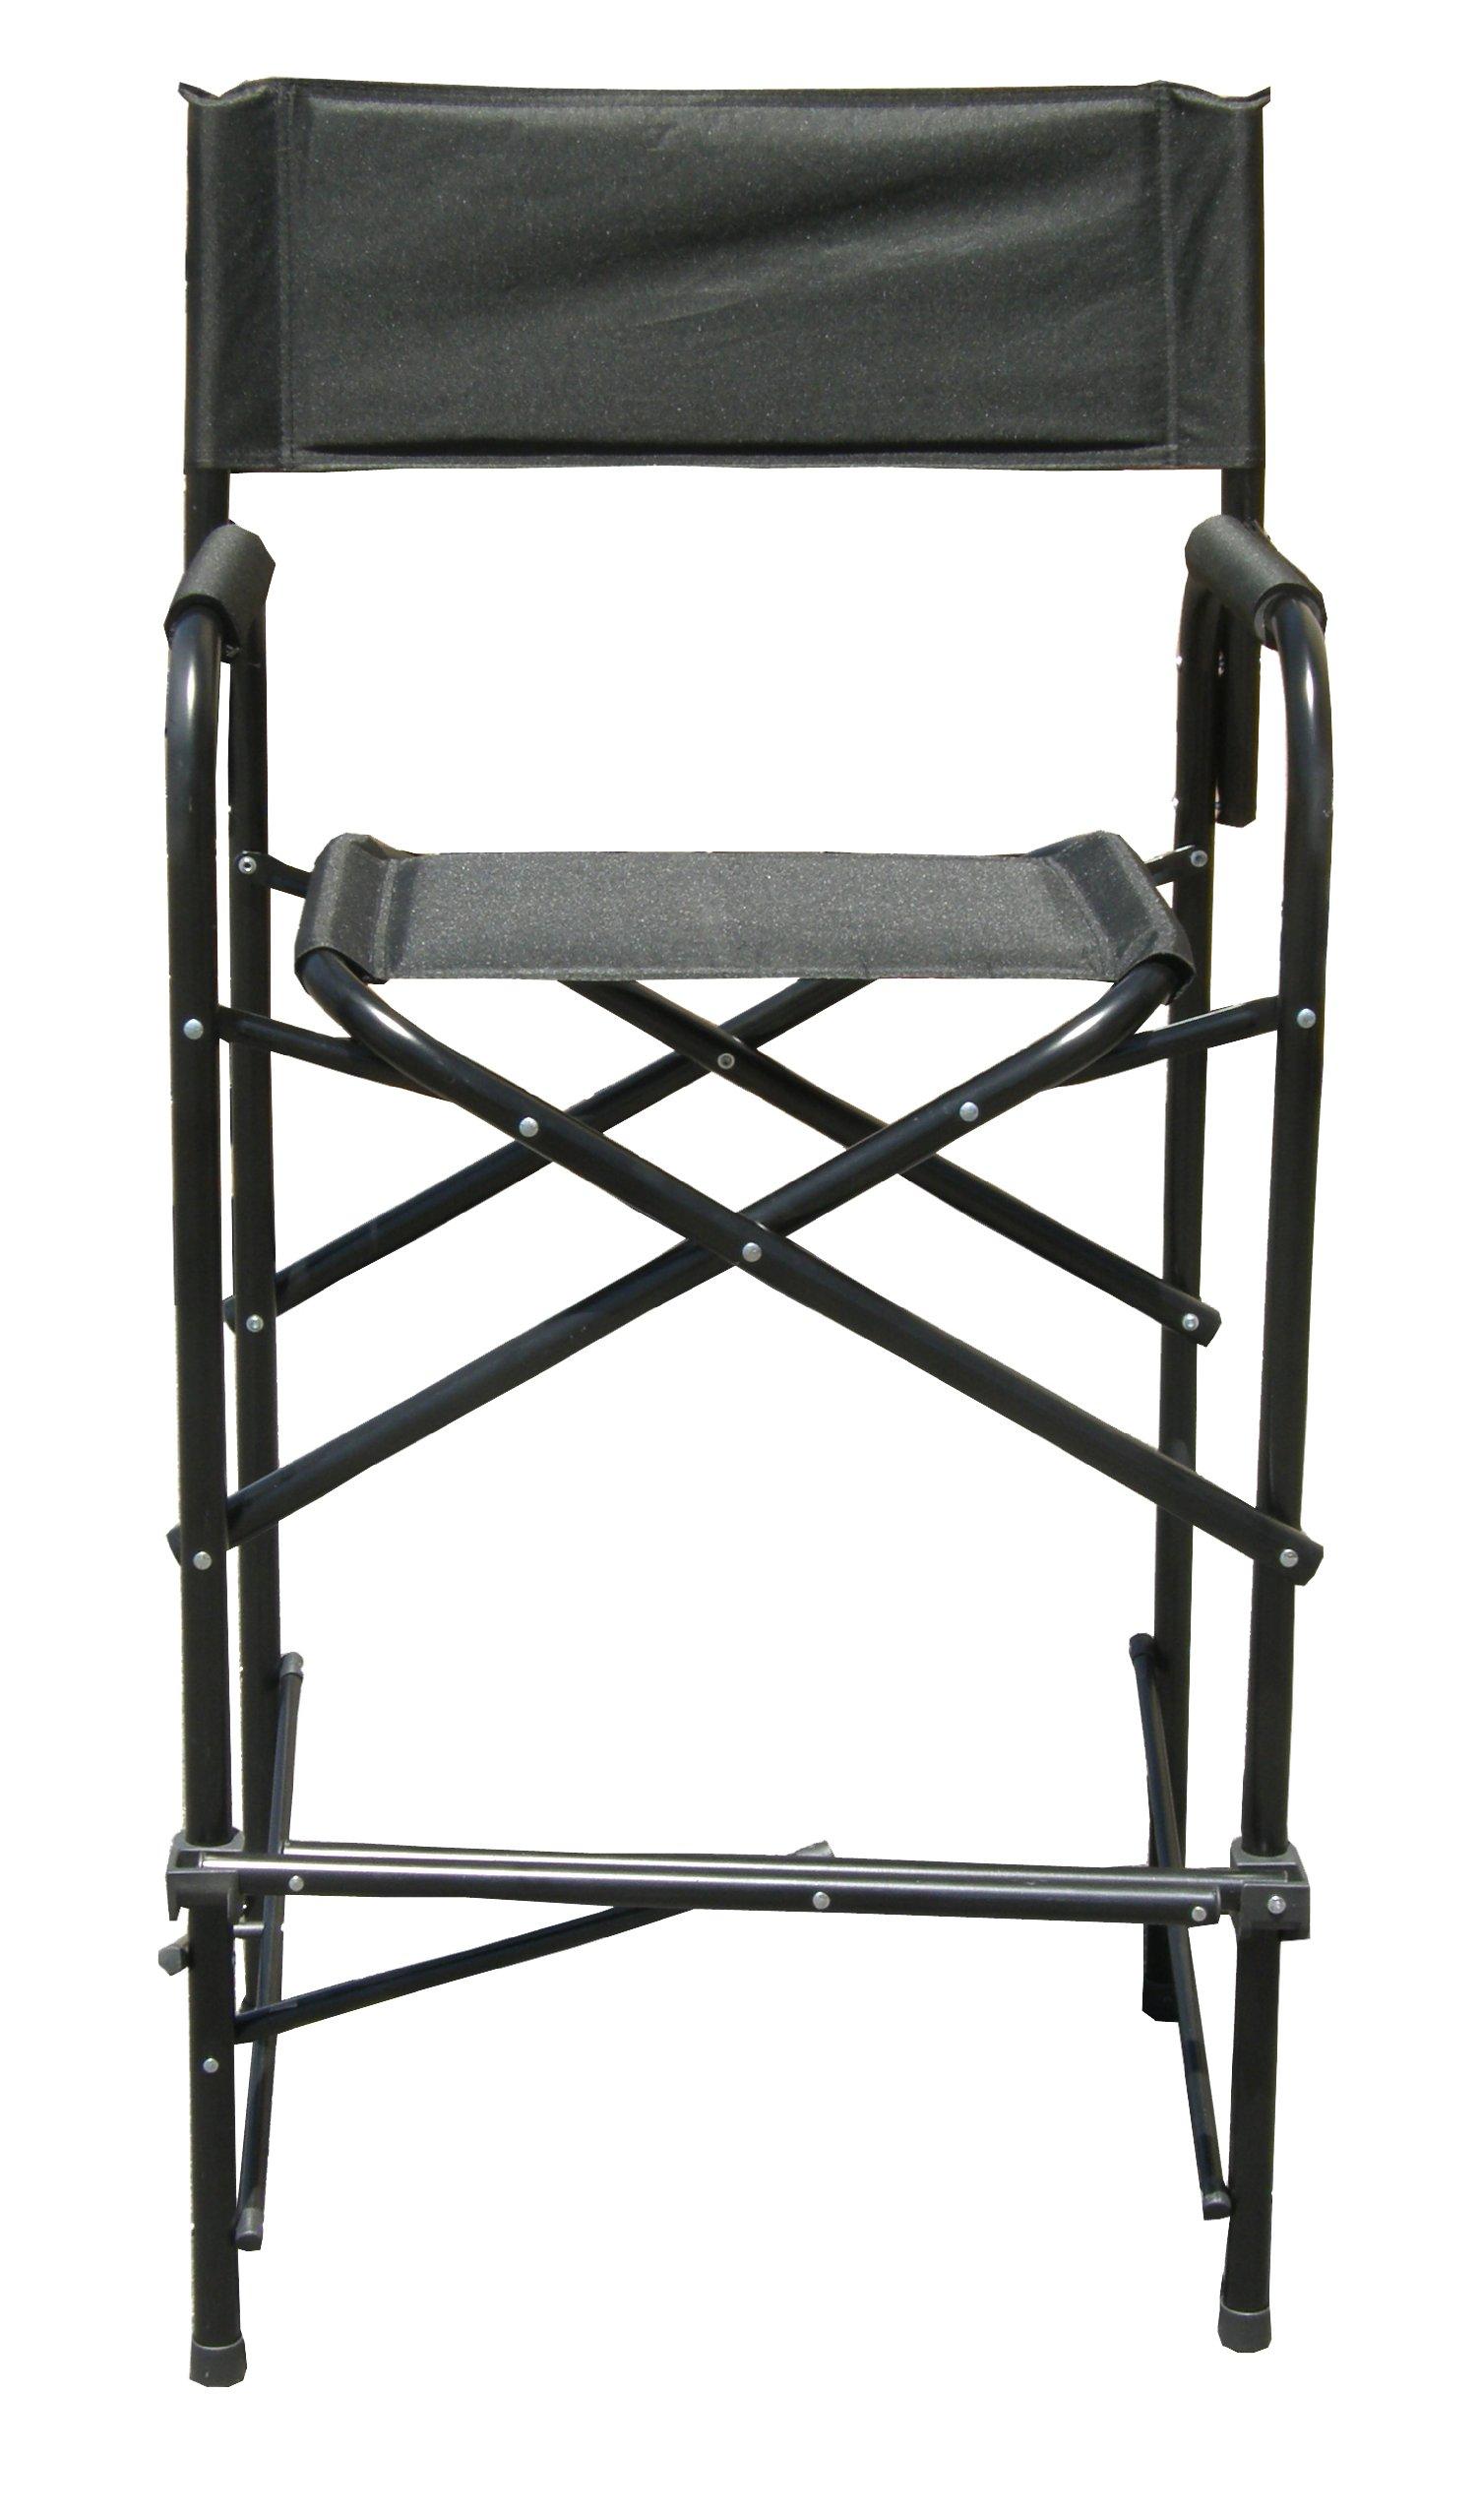 Impact Canopy Tall Folding Director's Chair, Heavy Duty, Aluminum Frame Chair, Black by Impact Canopy